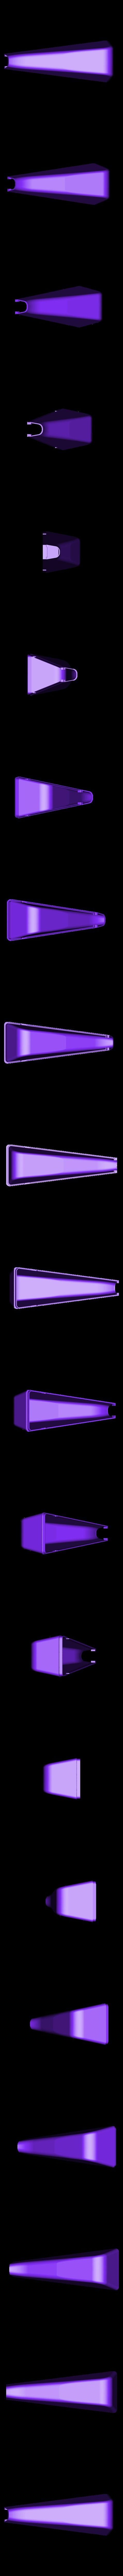 capot.stl Download free STL file 3 RC wheels • 3D printing template, Boxplyer